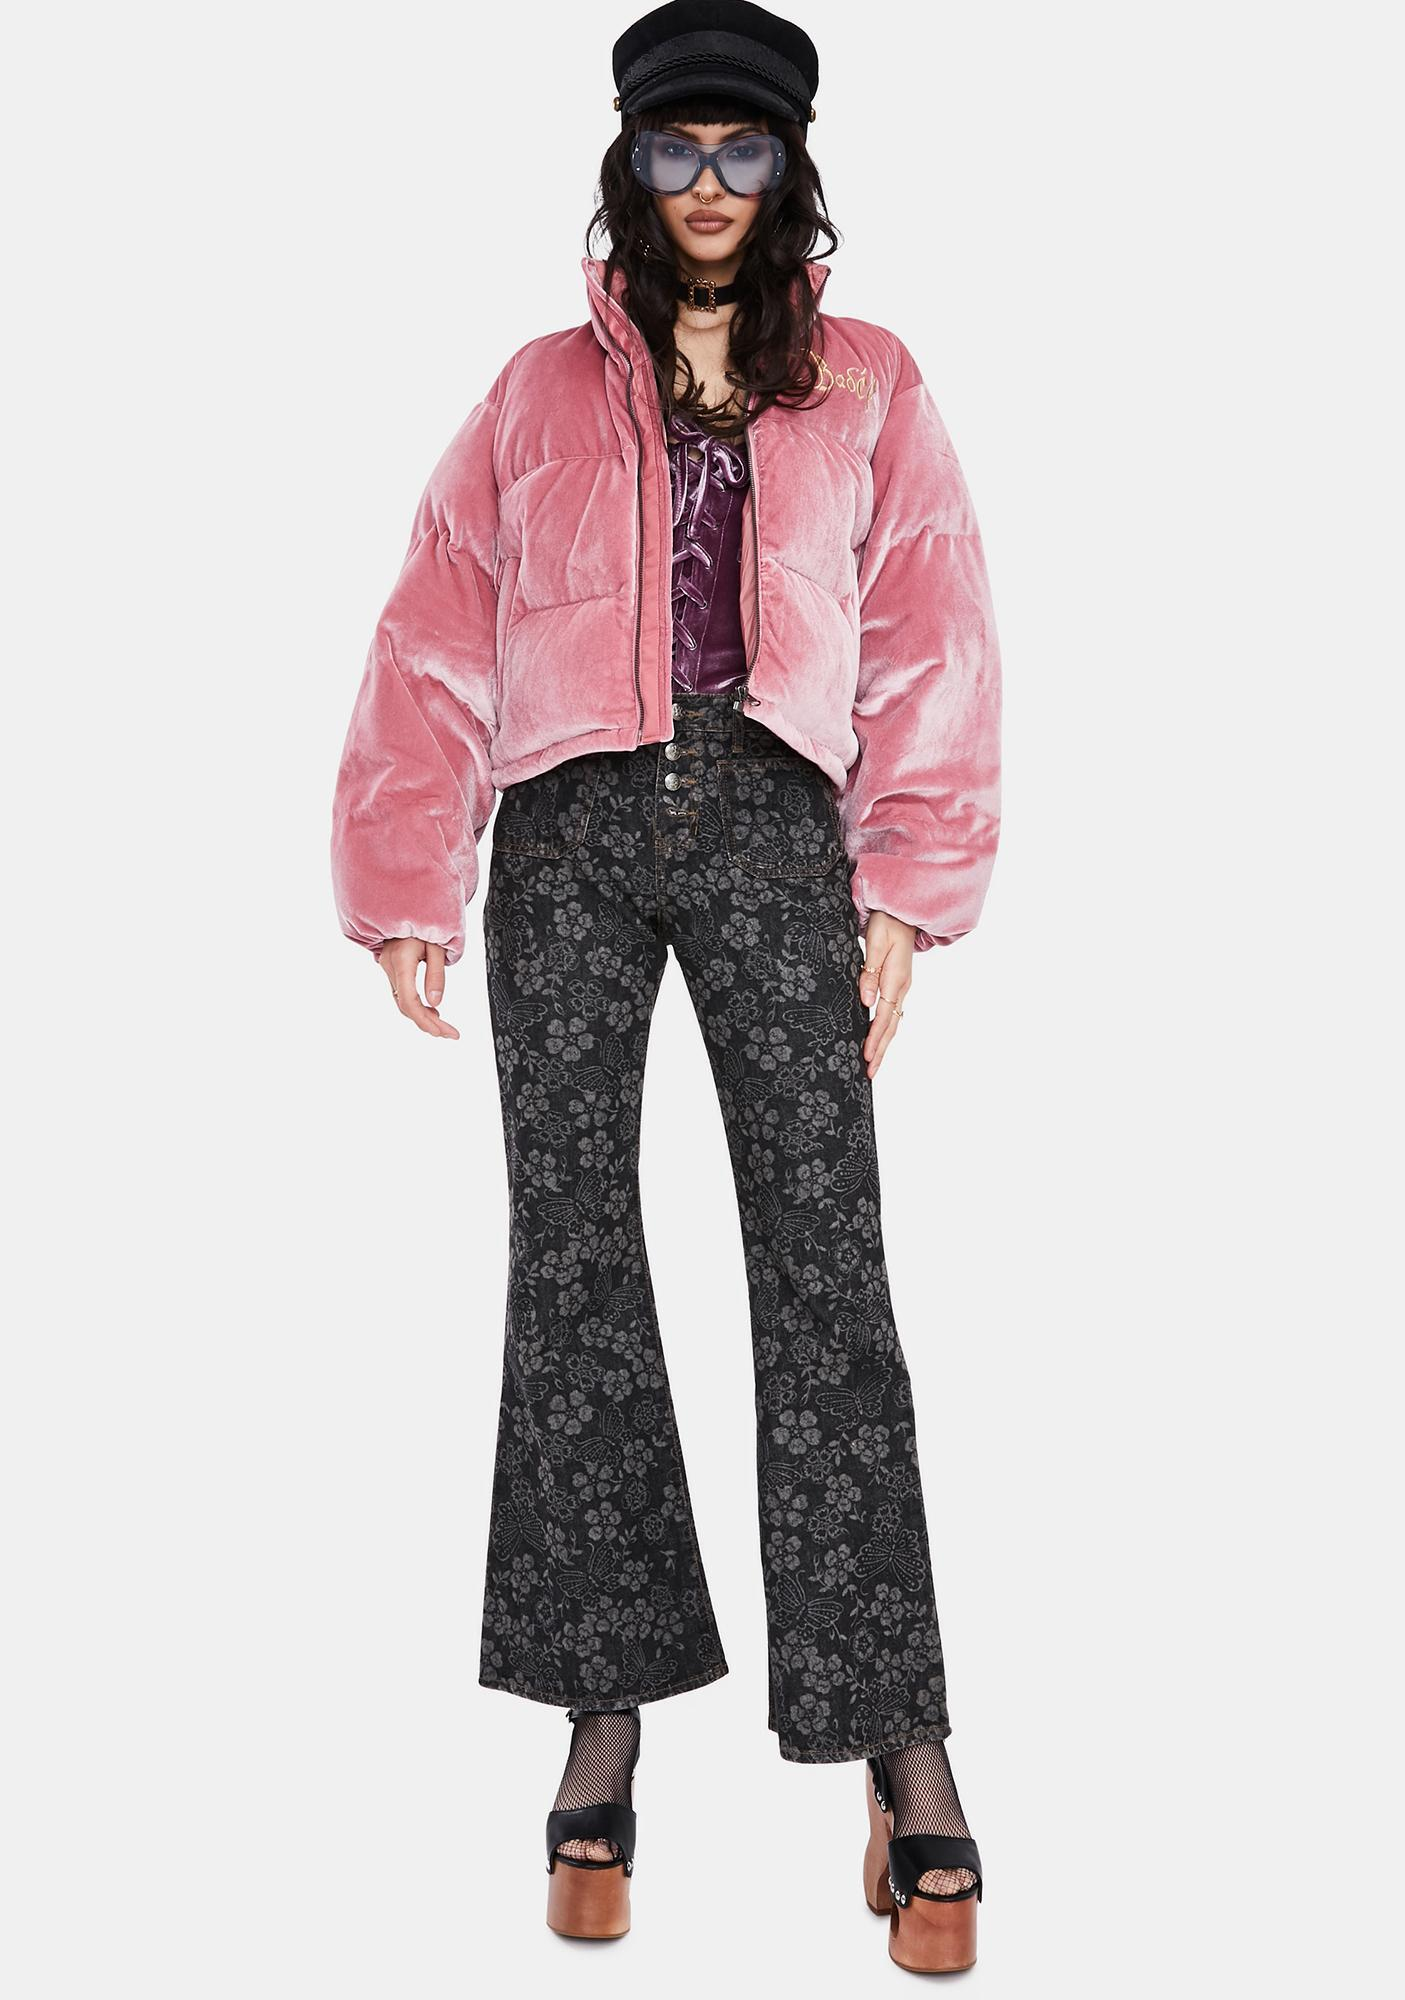 BADEE Velour Bubble Jacket